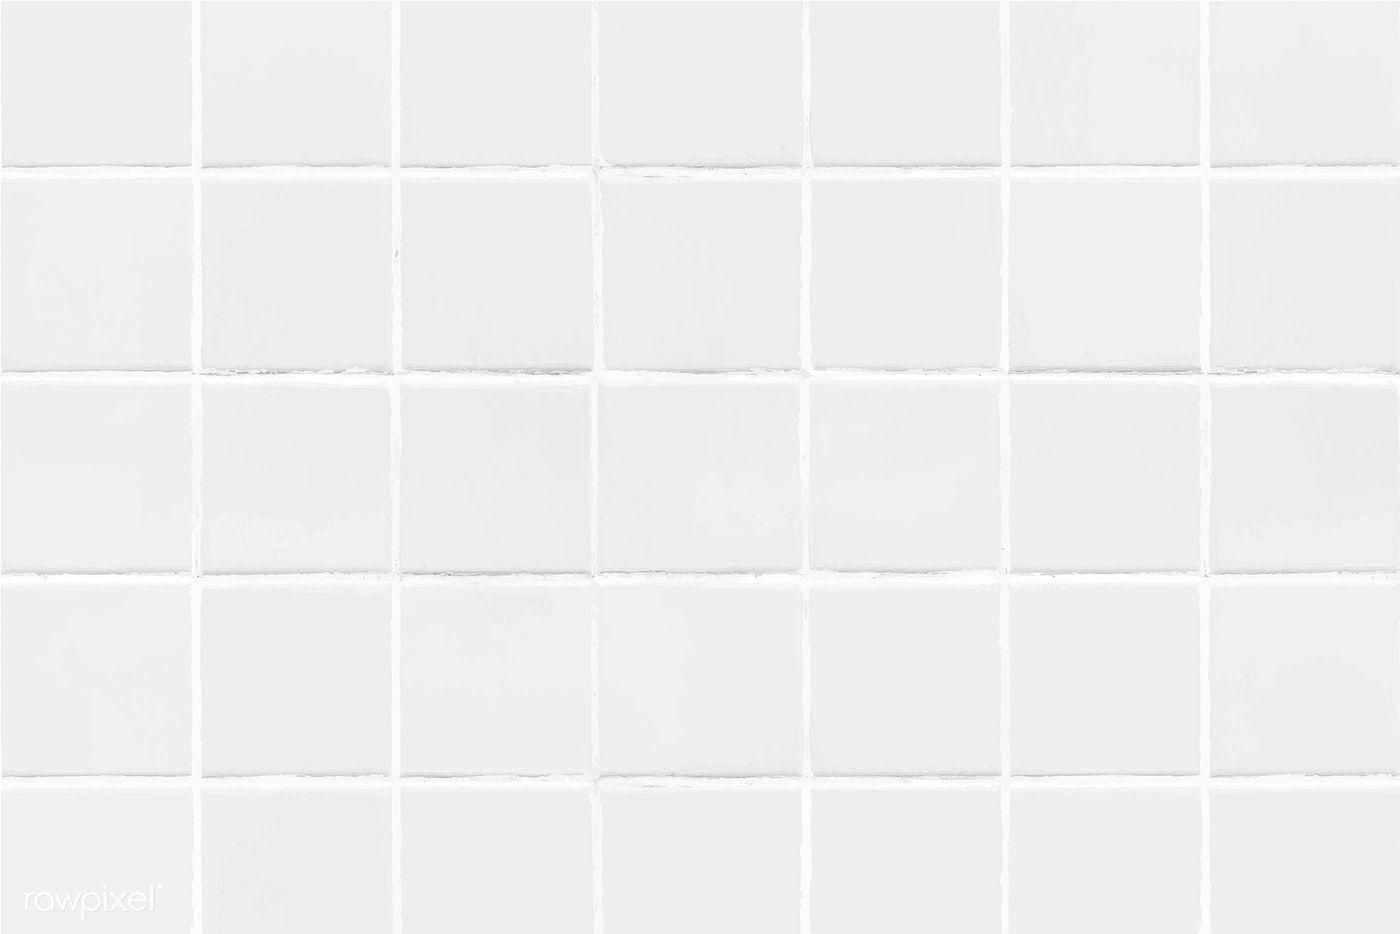 Download Premium Vector Of White Square Tiled Texture Background 514181 White Square Tiles Tiles Texture Square Tile